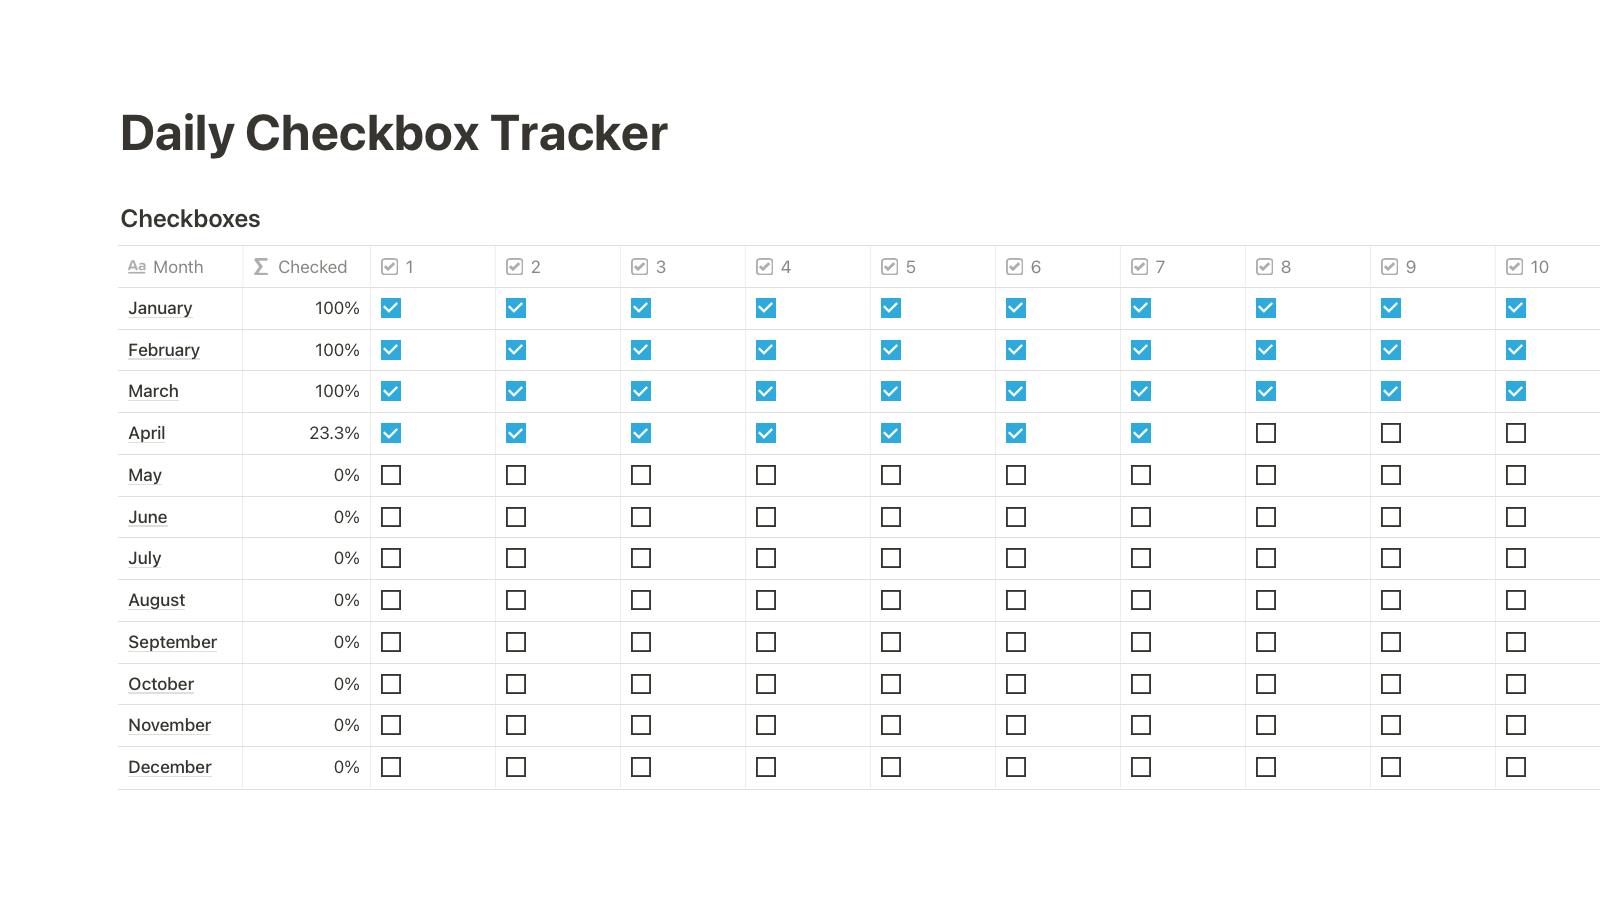 Daily Checkbox Tracker